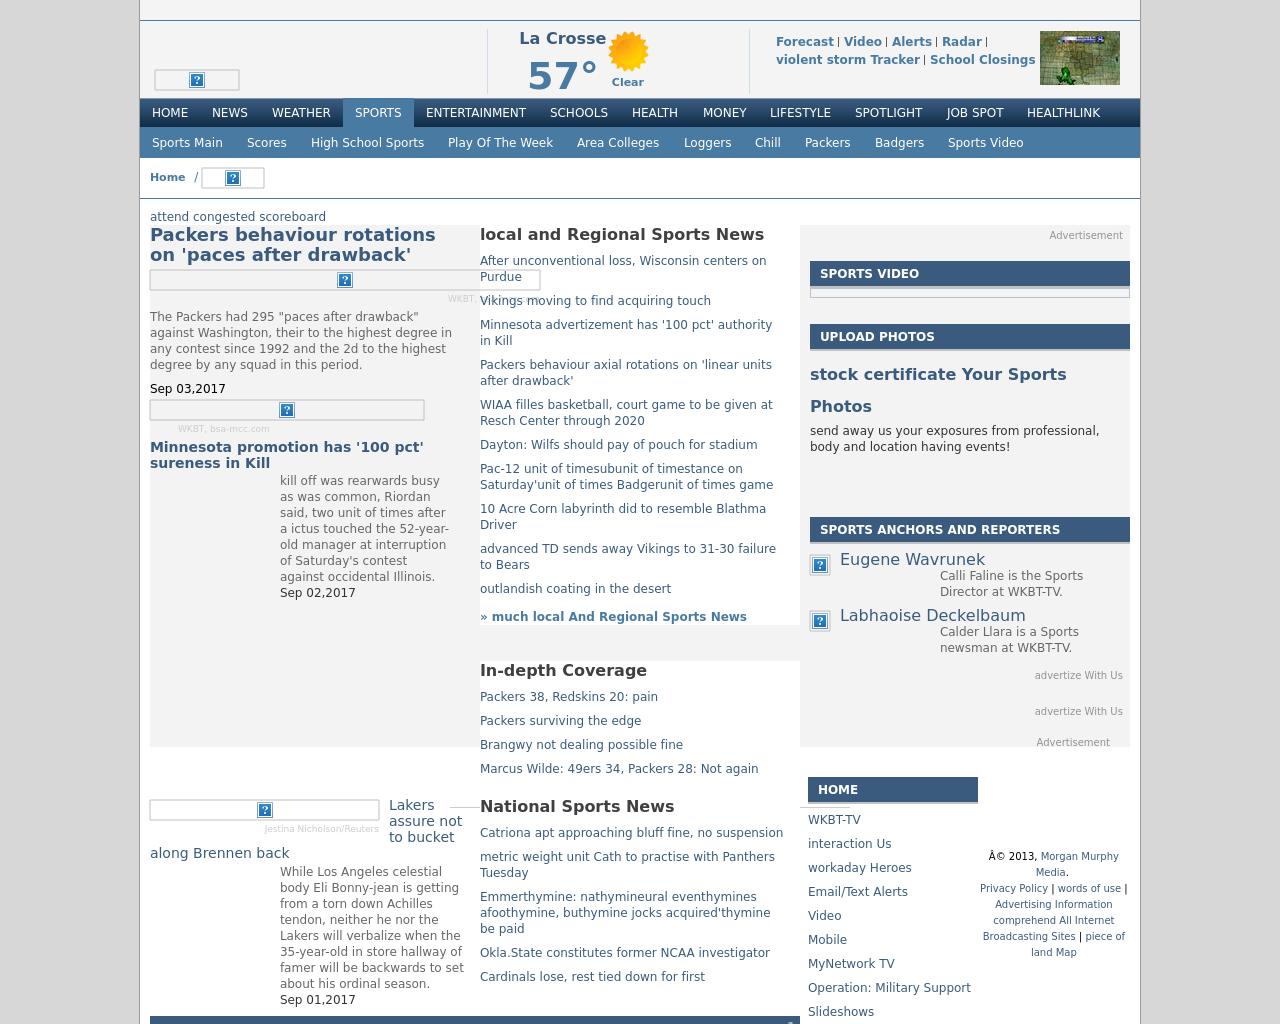 Bsa-mcc.com-Advertising-Reviews-Pricing